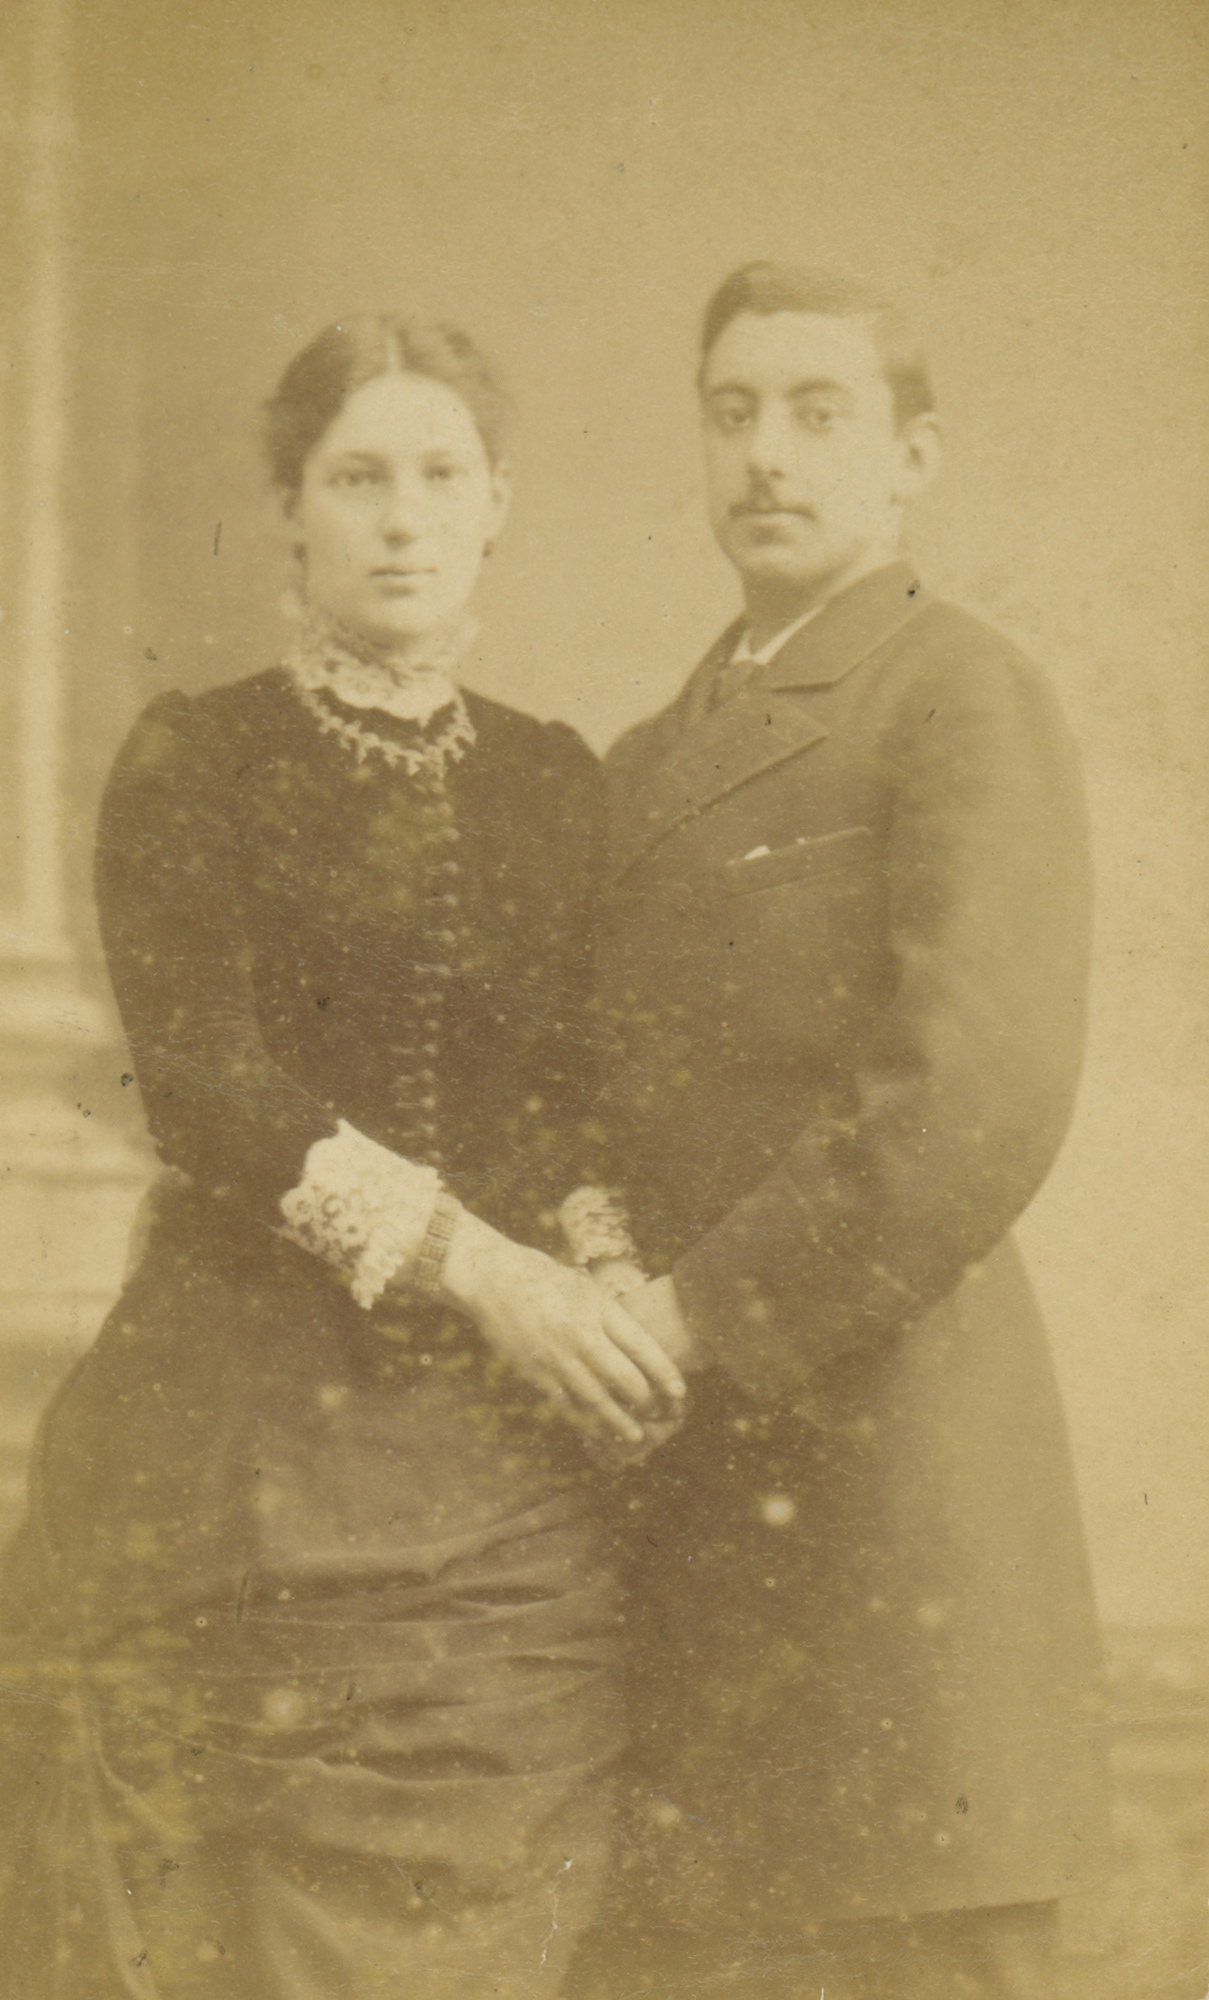 Ida Meursing en Marinus Korthals Altes